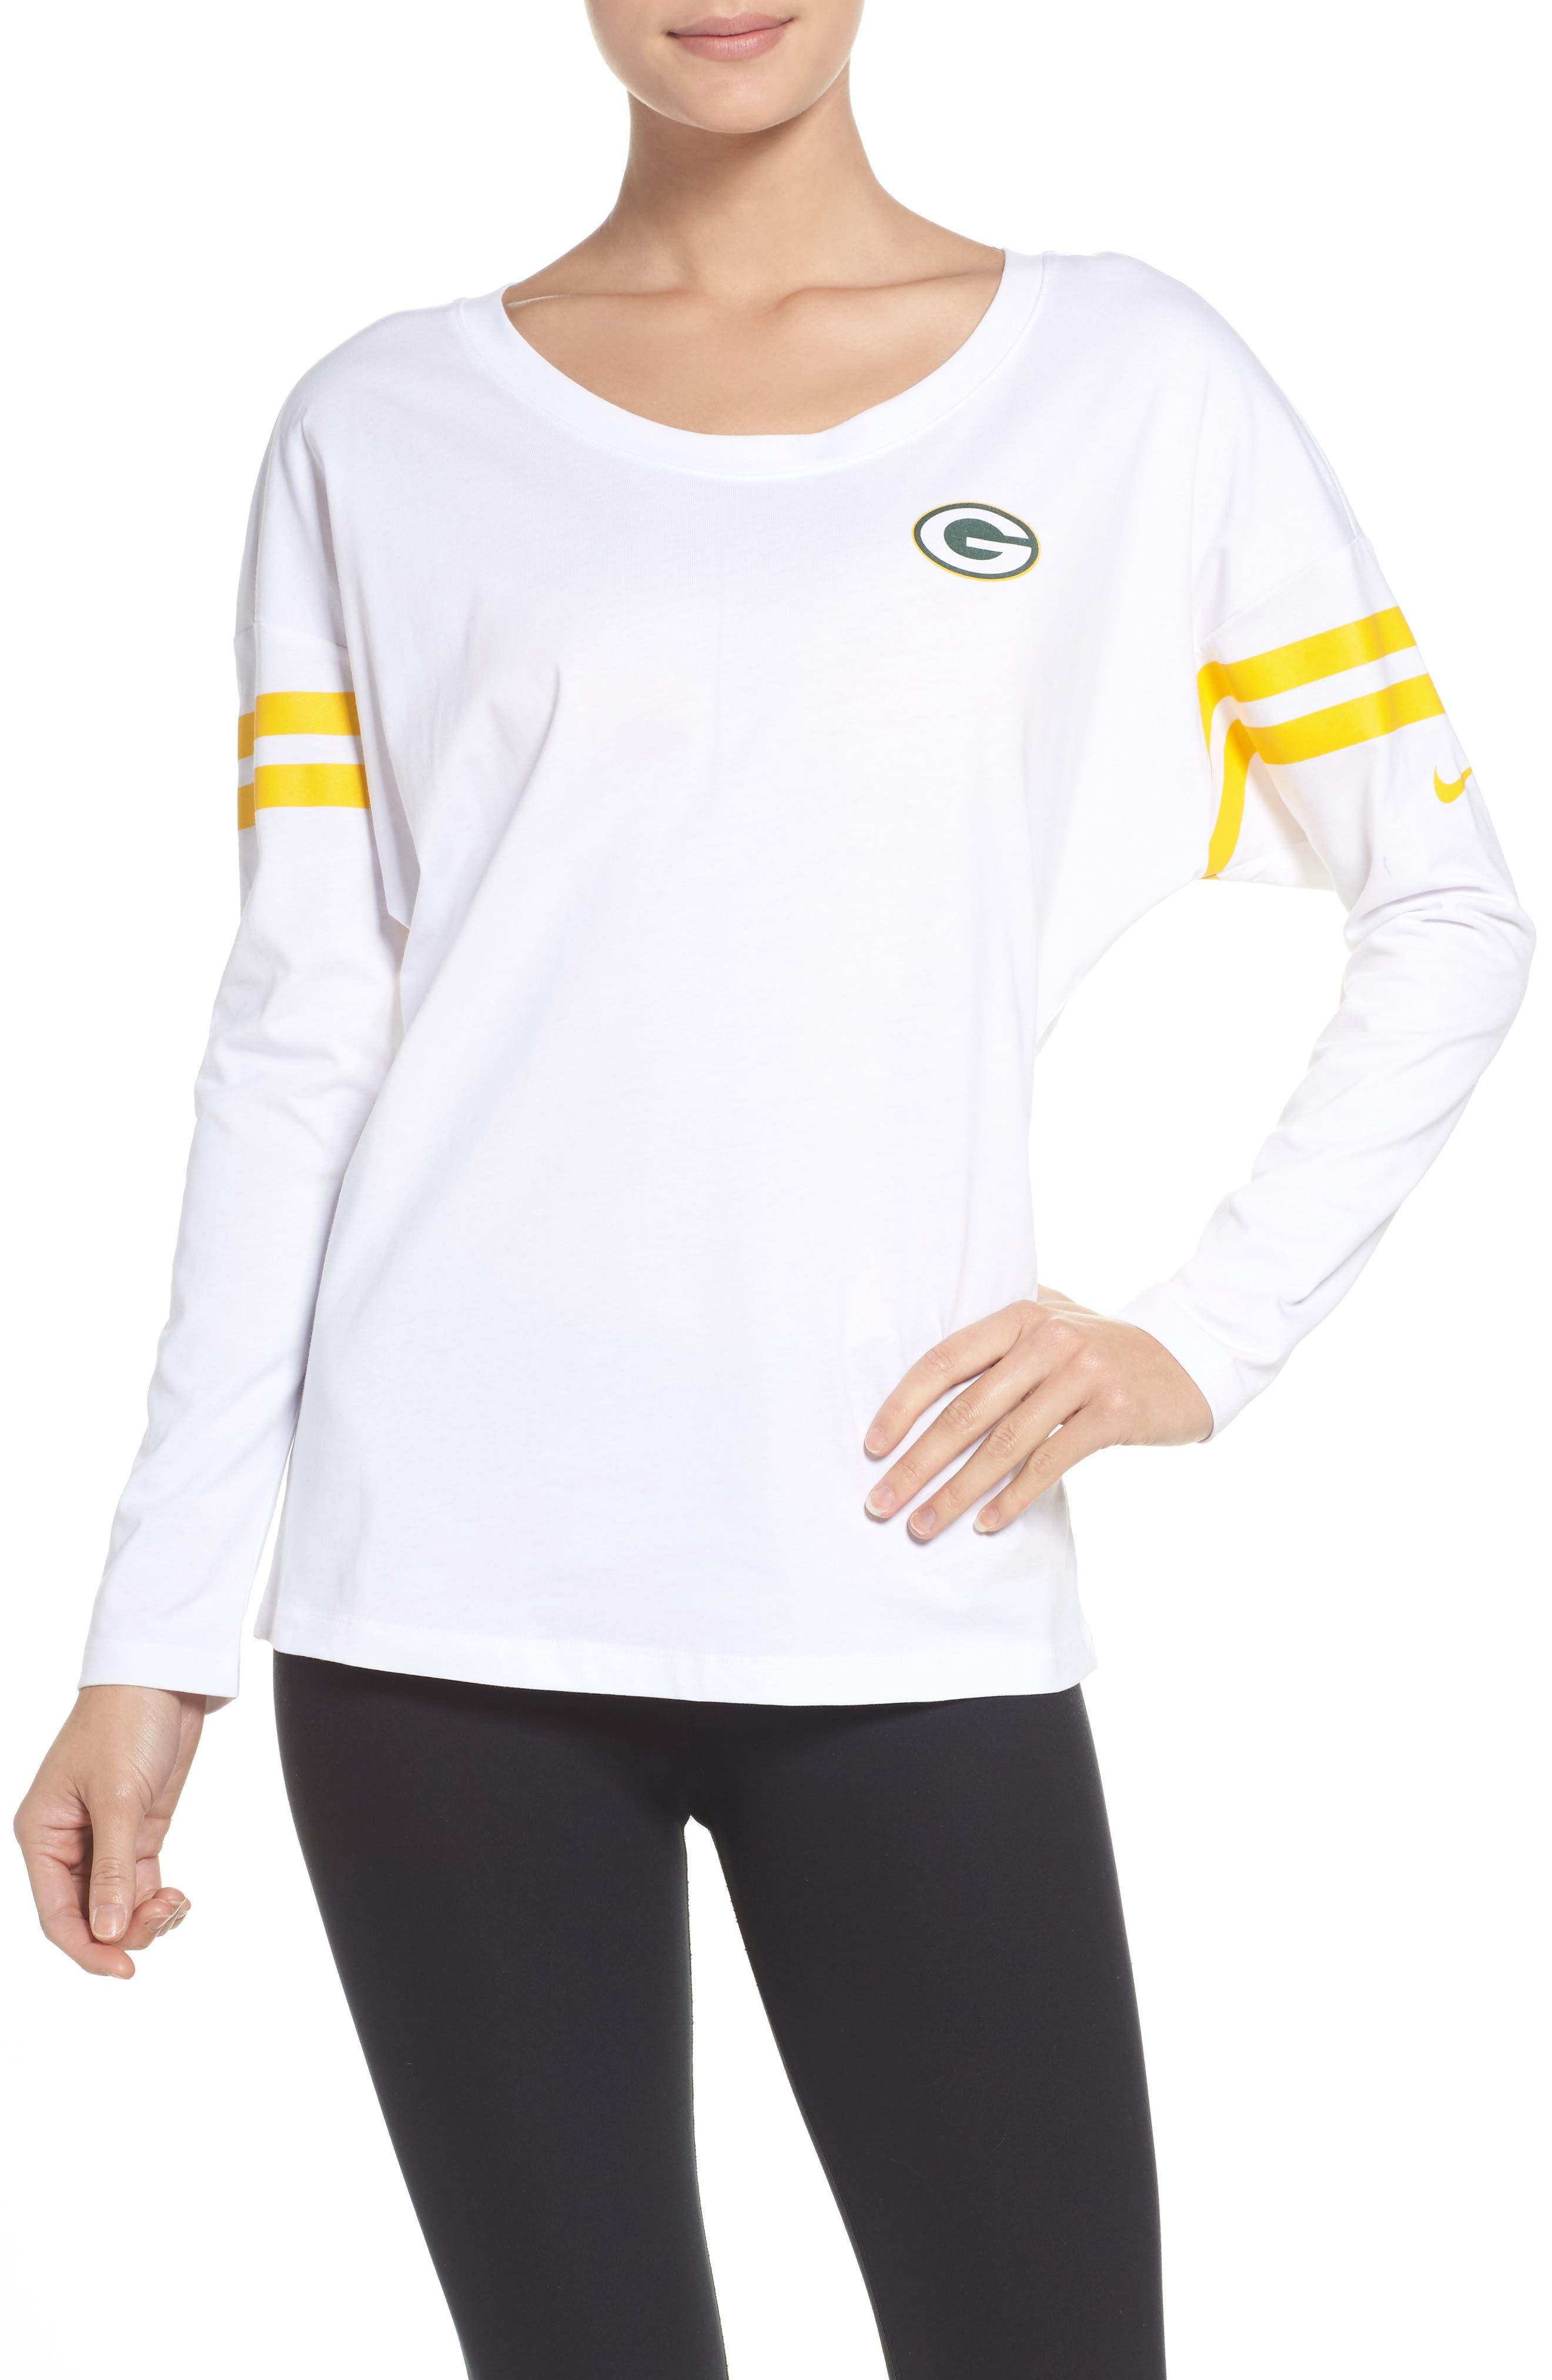 Alternate Image 1 Selected - Nike NFL Tailgate Tee